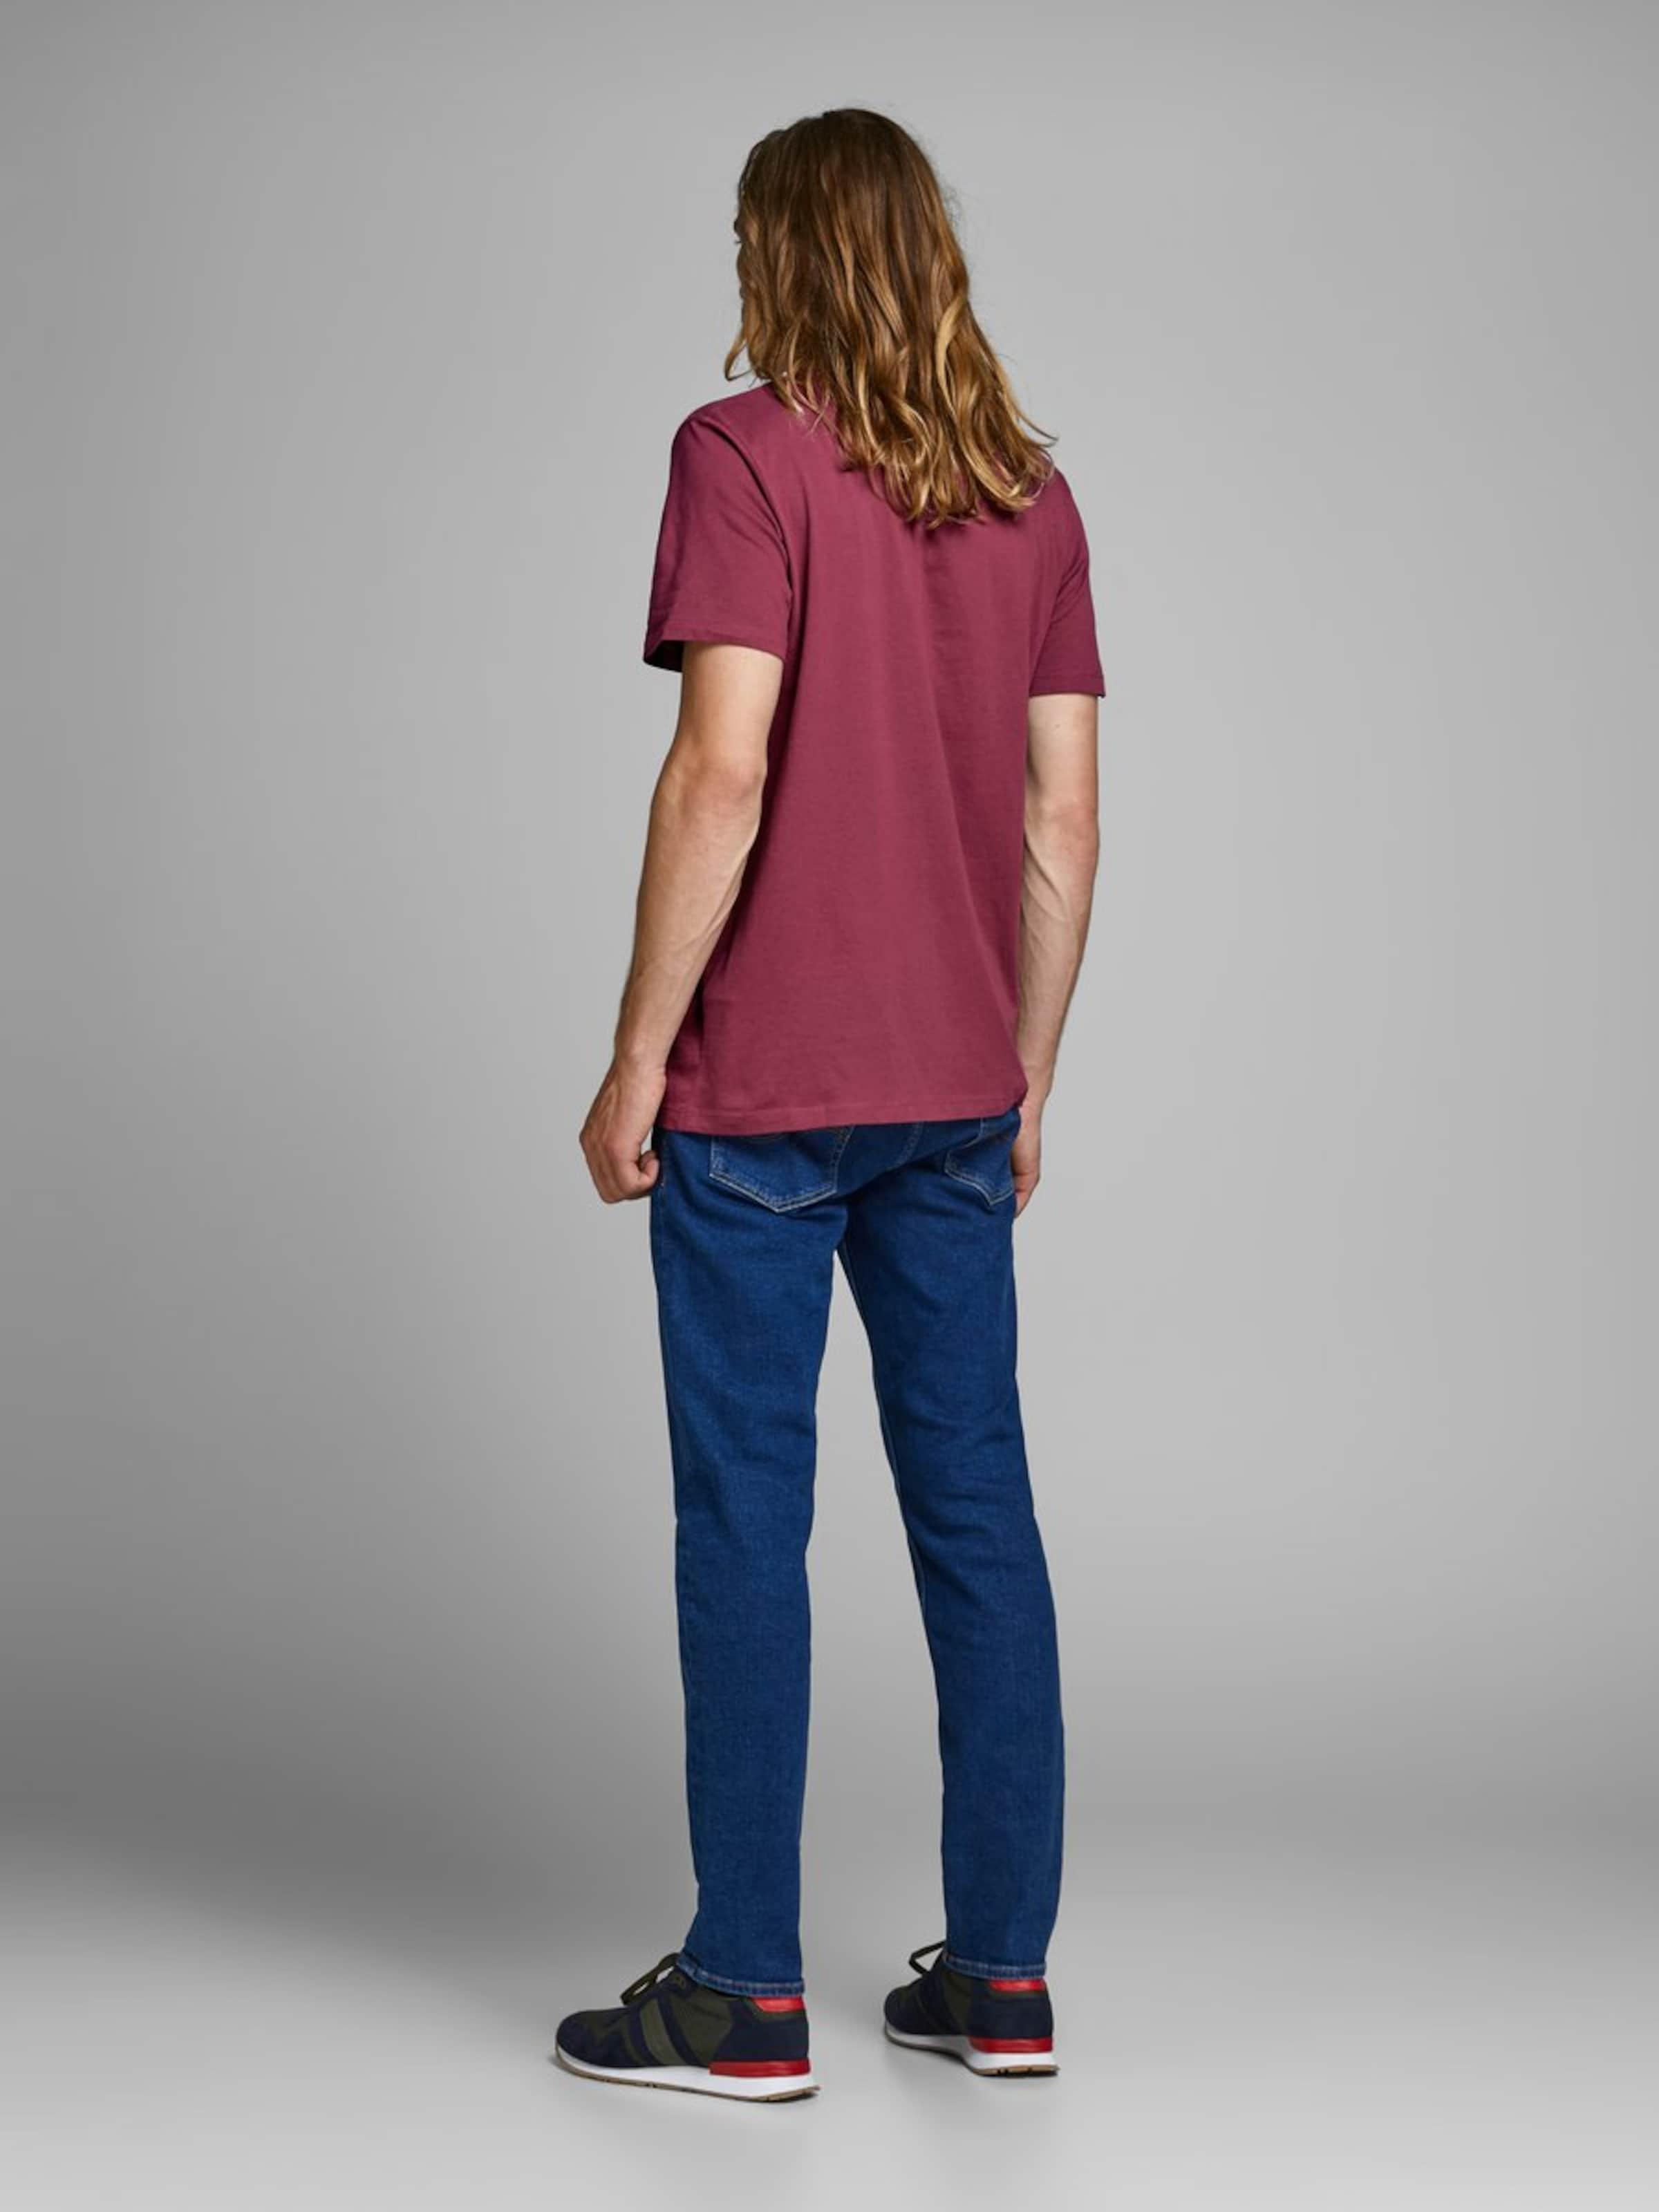 T Jones TurquoiseViolet Jackamp; shirt Rouge En 3F1cTJlK